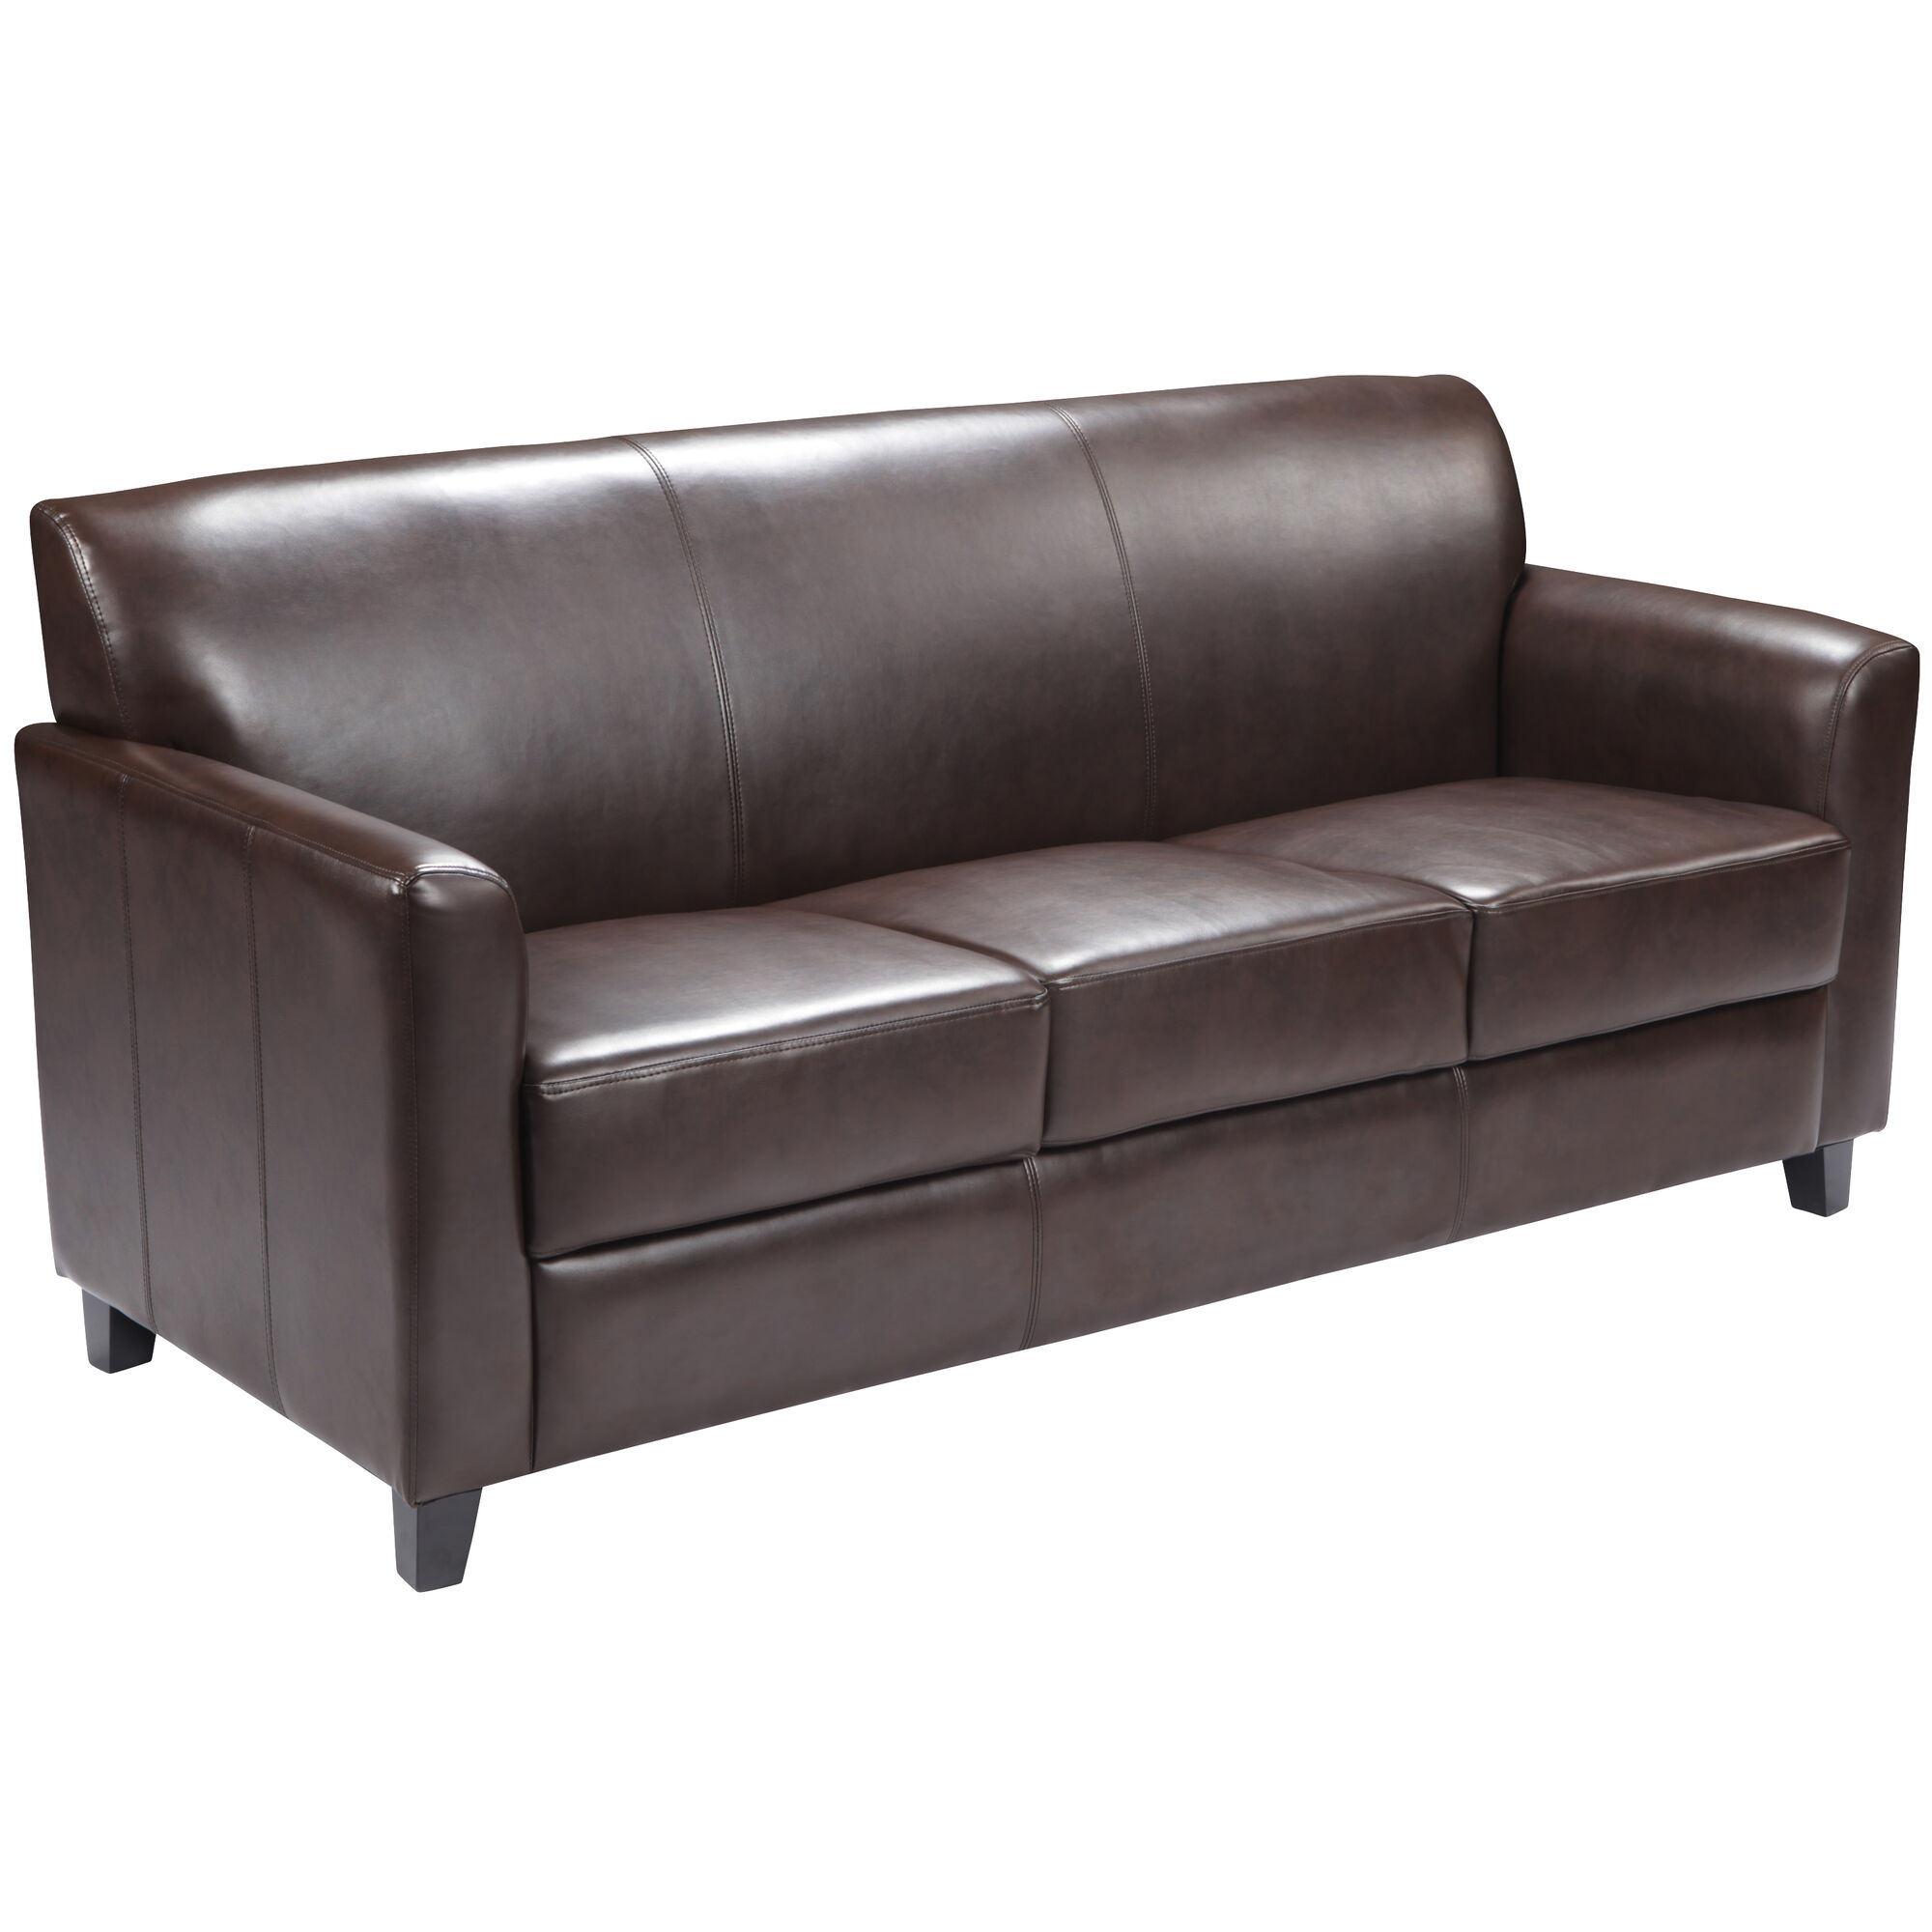 Swell Hercules Diplomat Series Brown Leather Sofa Camellatalisay Diy Chair Ideas Camellatalisaycom